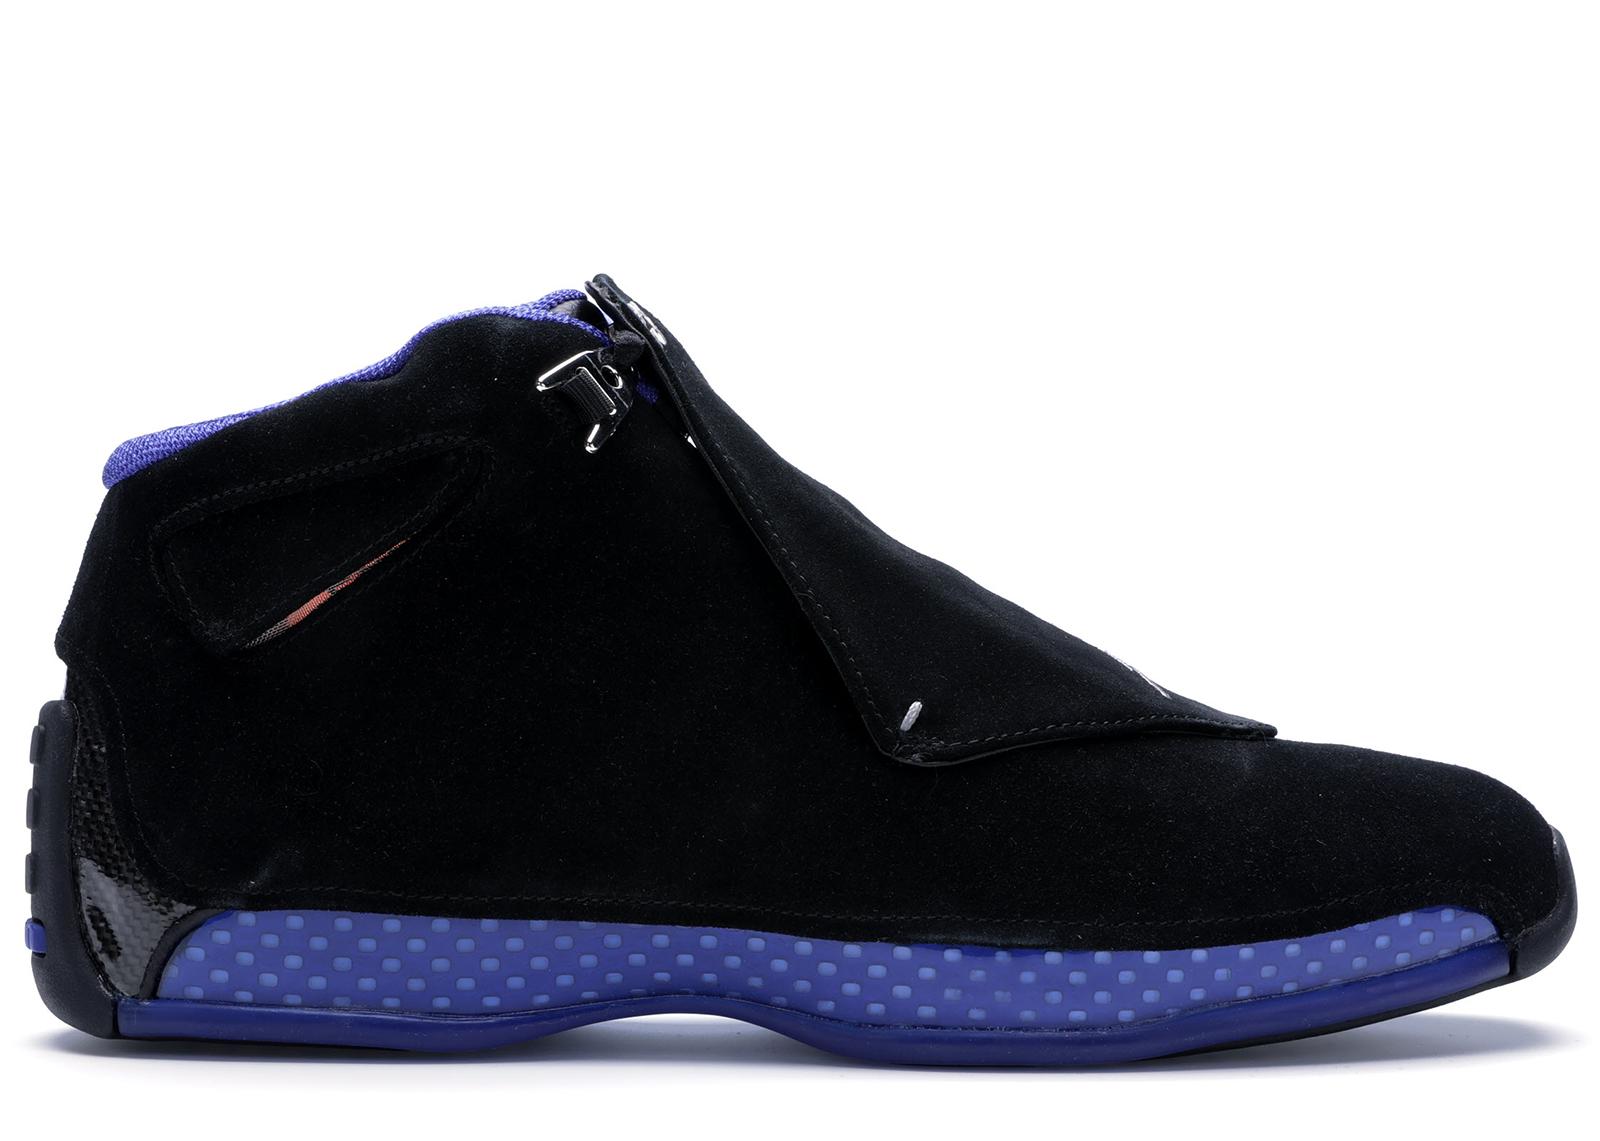 Jordan 18 Retro Black Sport Royal (2018) - AA2494-007